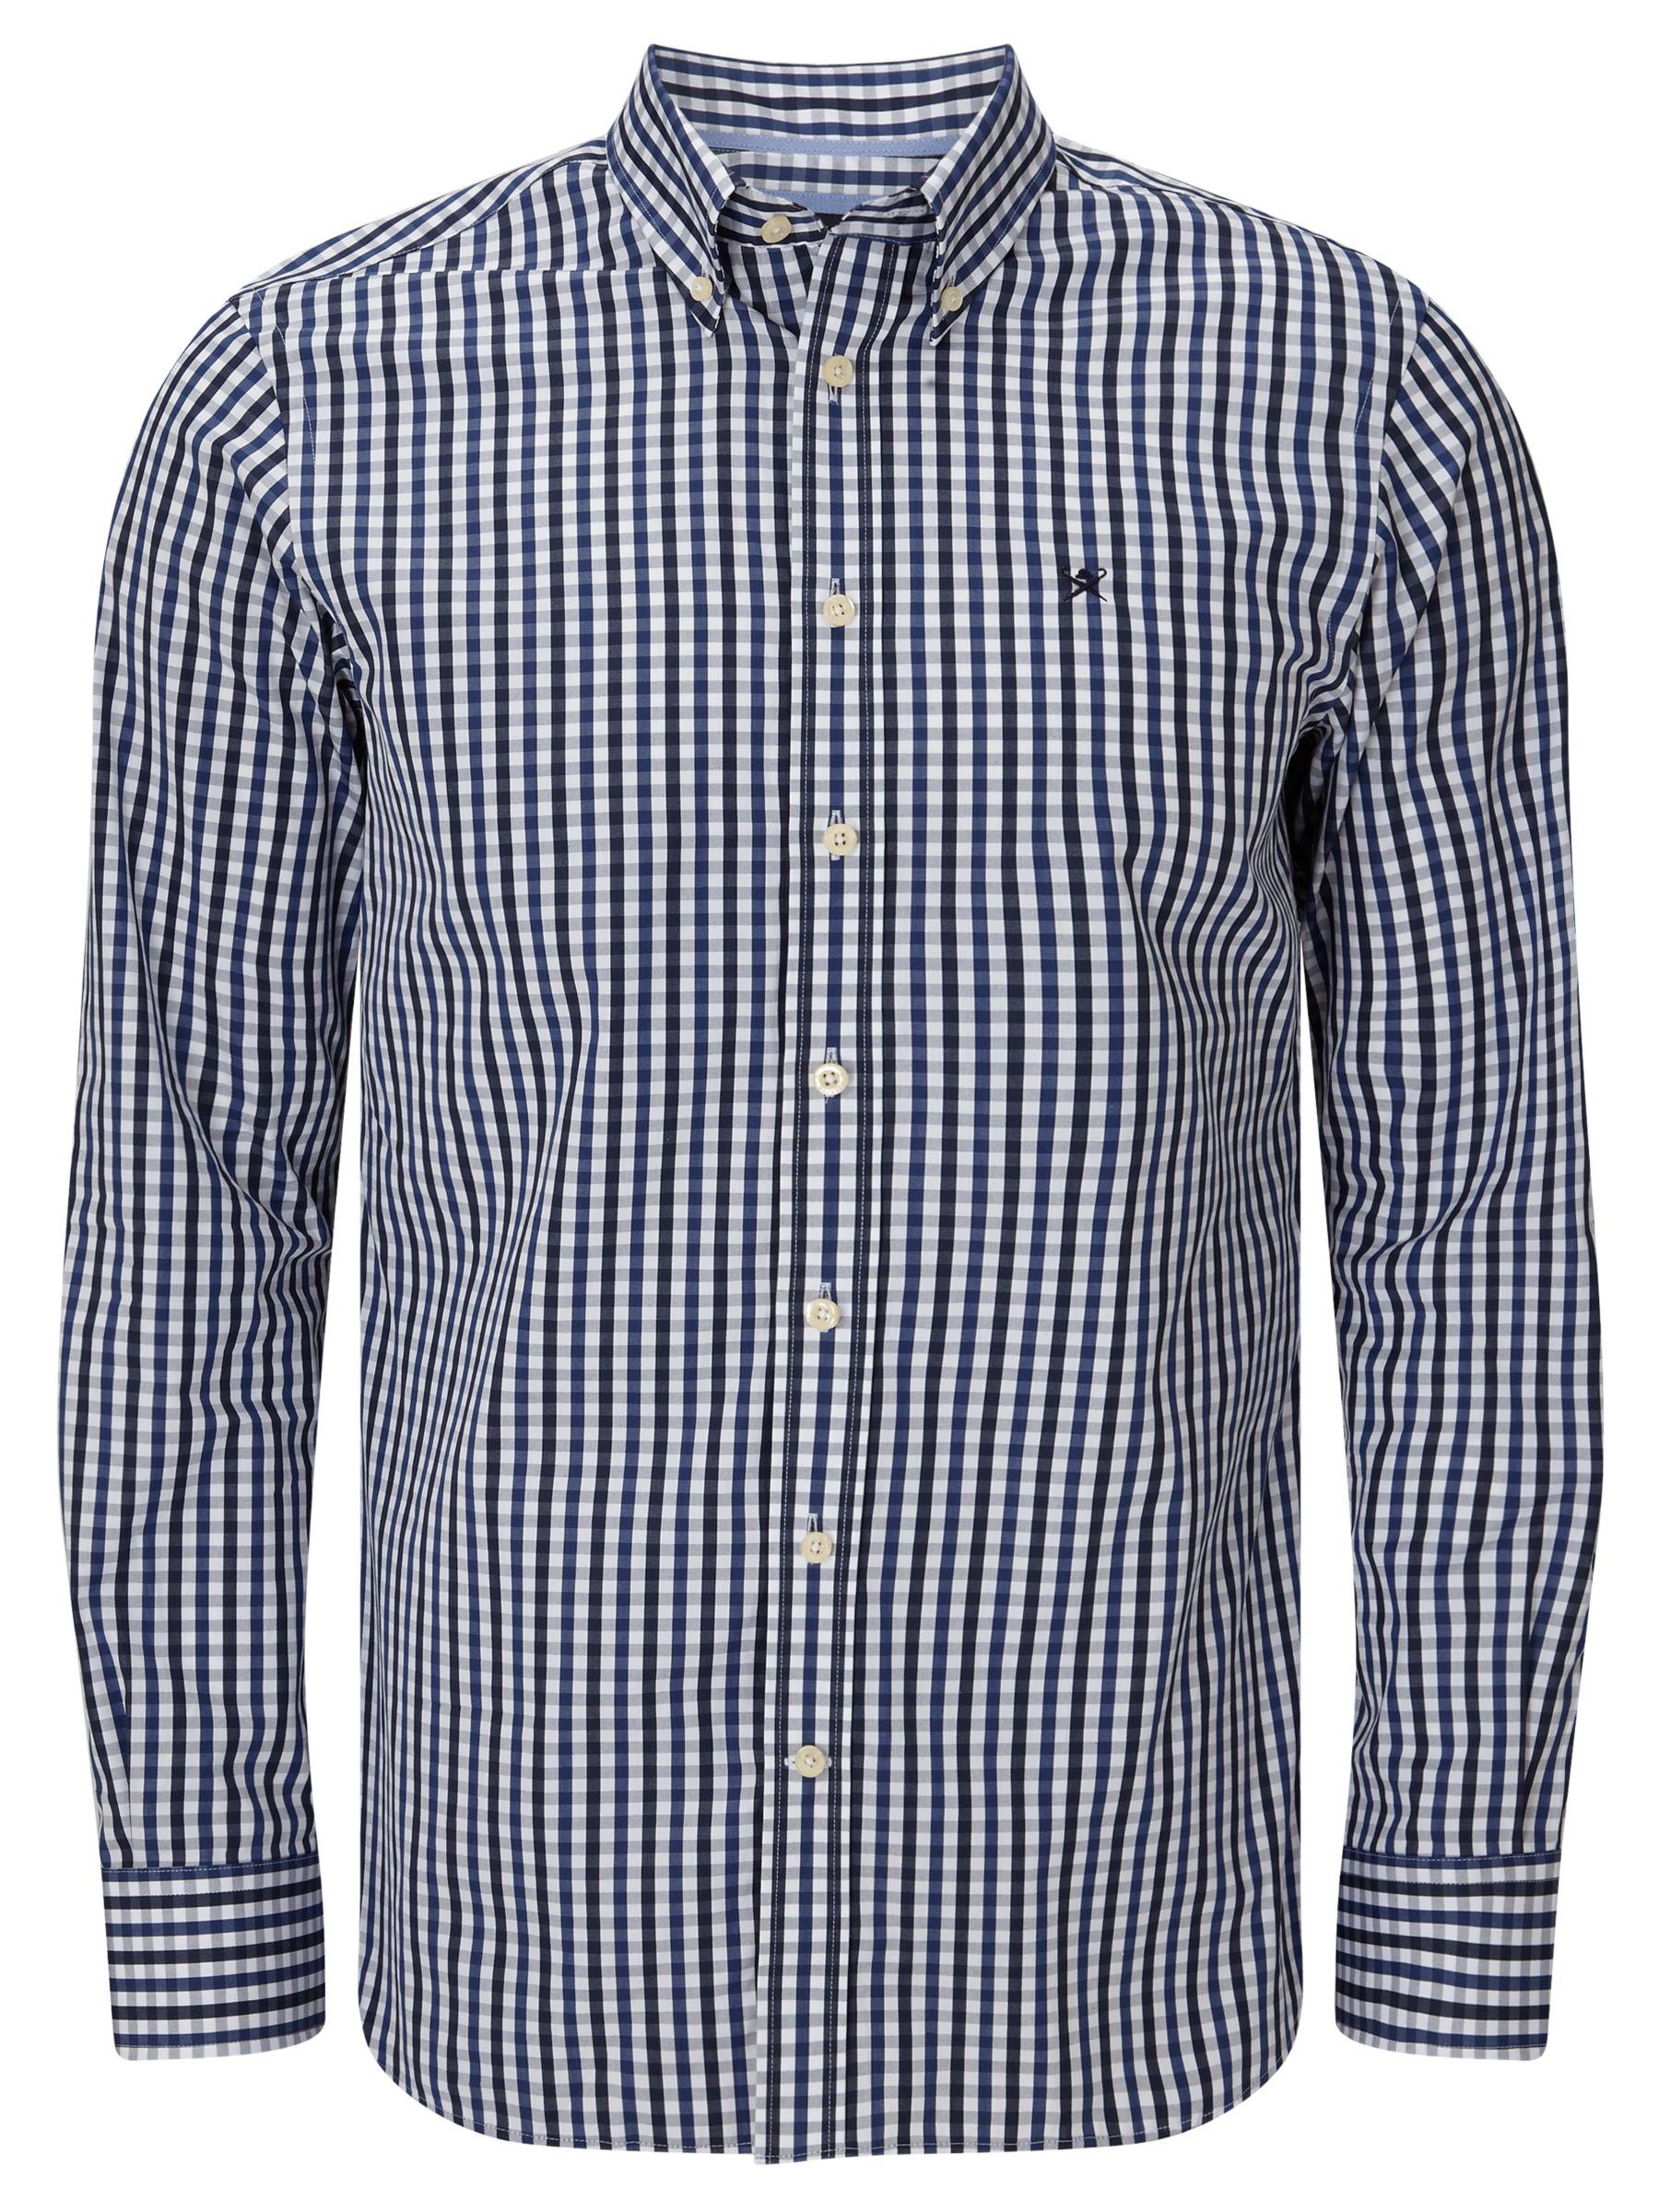 Hackett London Hackett London Classic Check Shirt